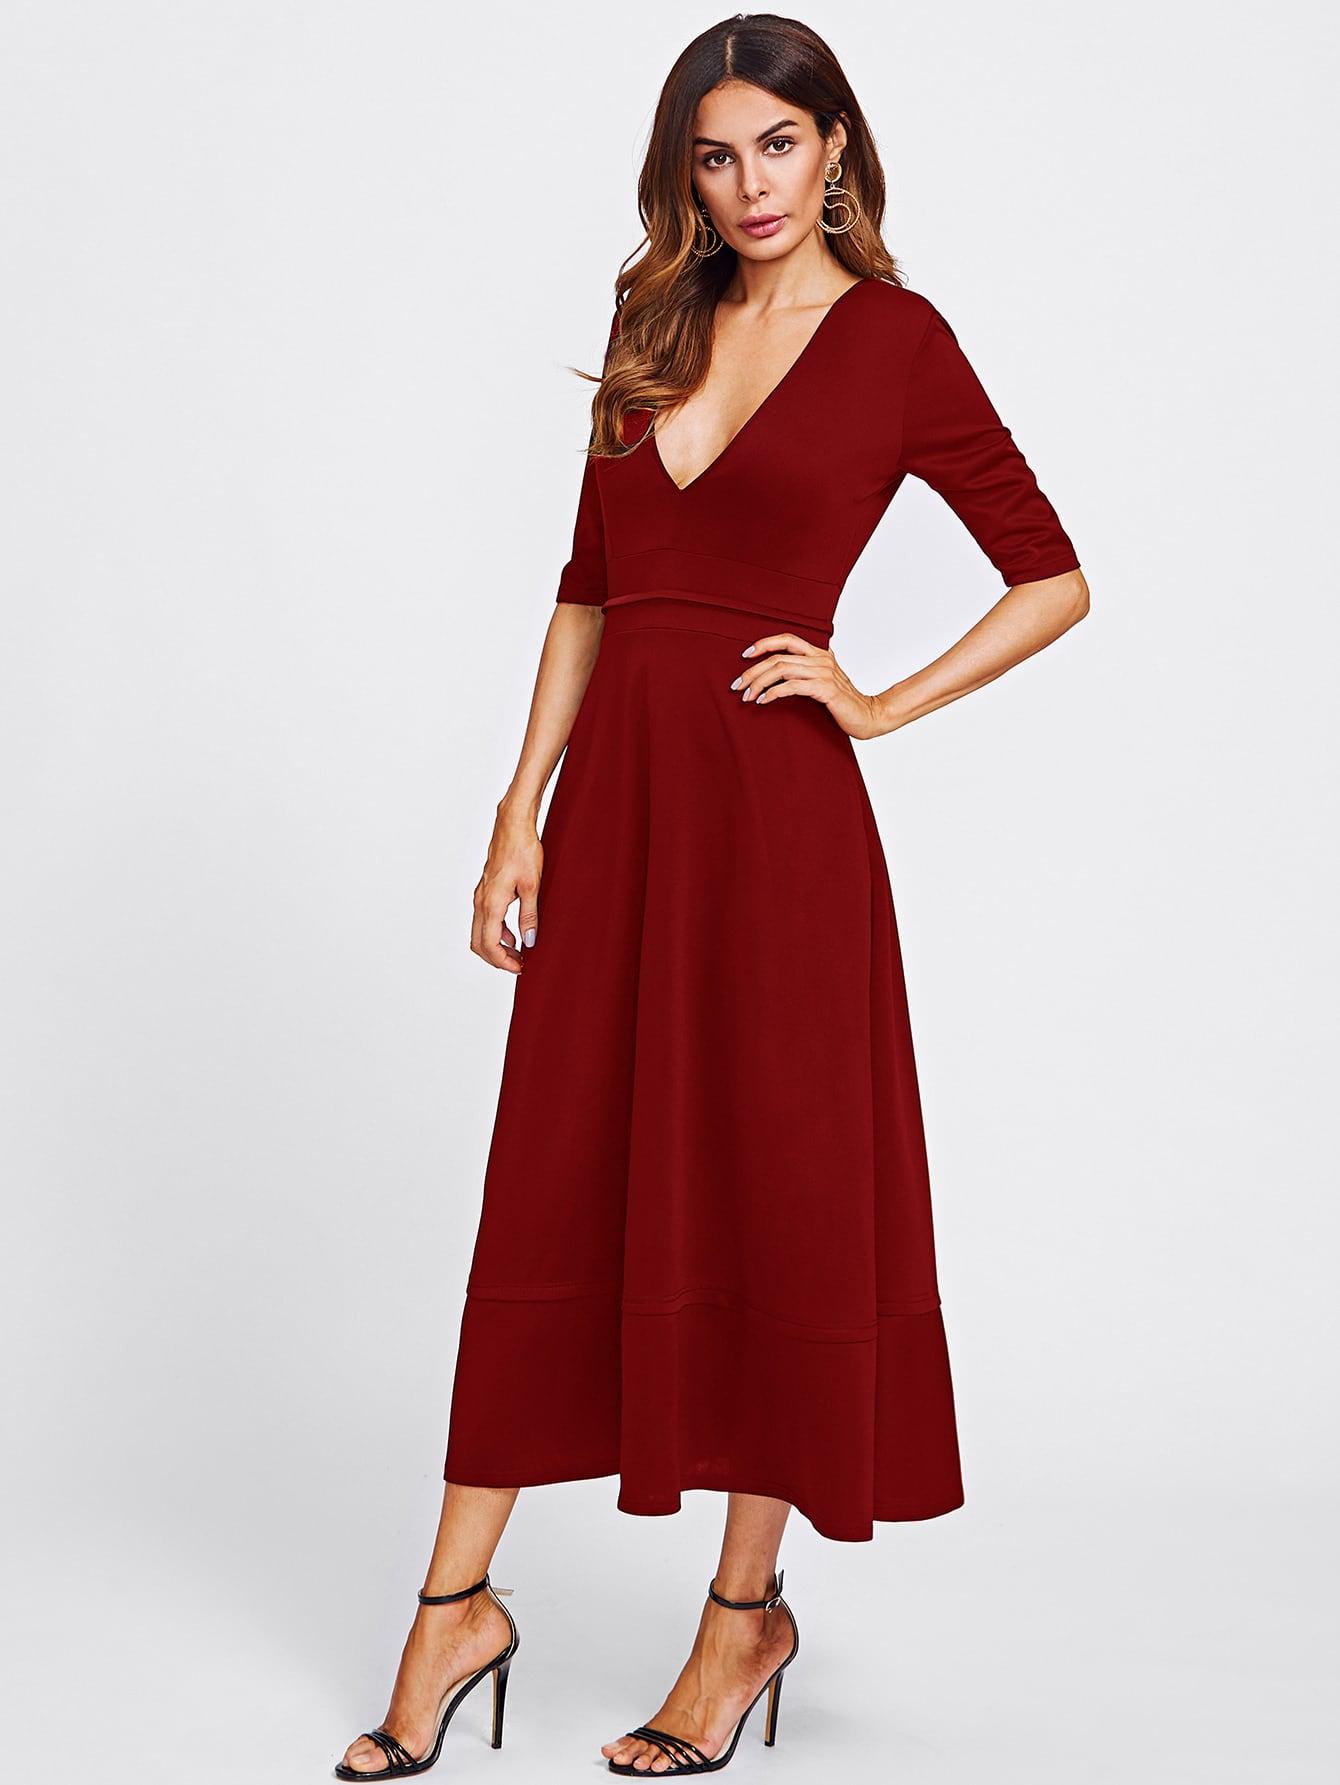 Langes Kleid mit doppeltem V Ausschnitt- German romwe